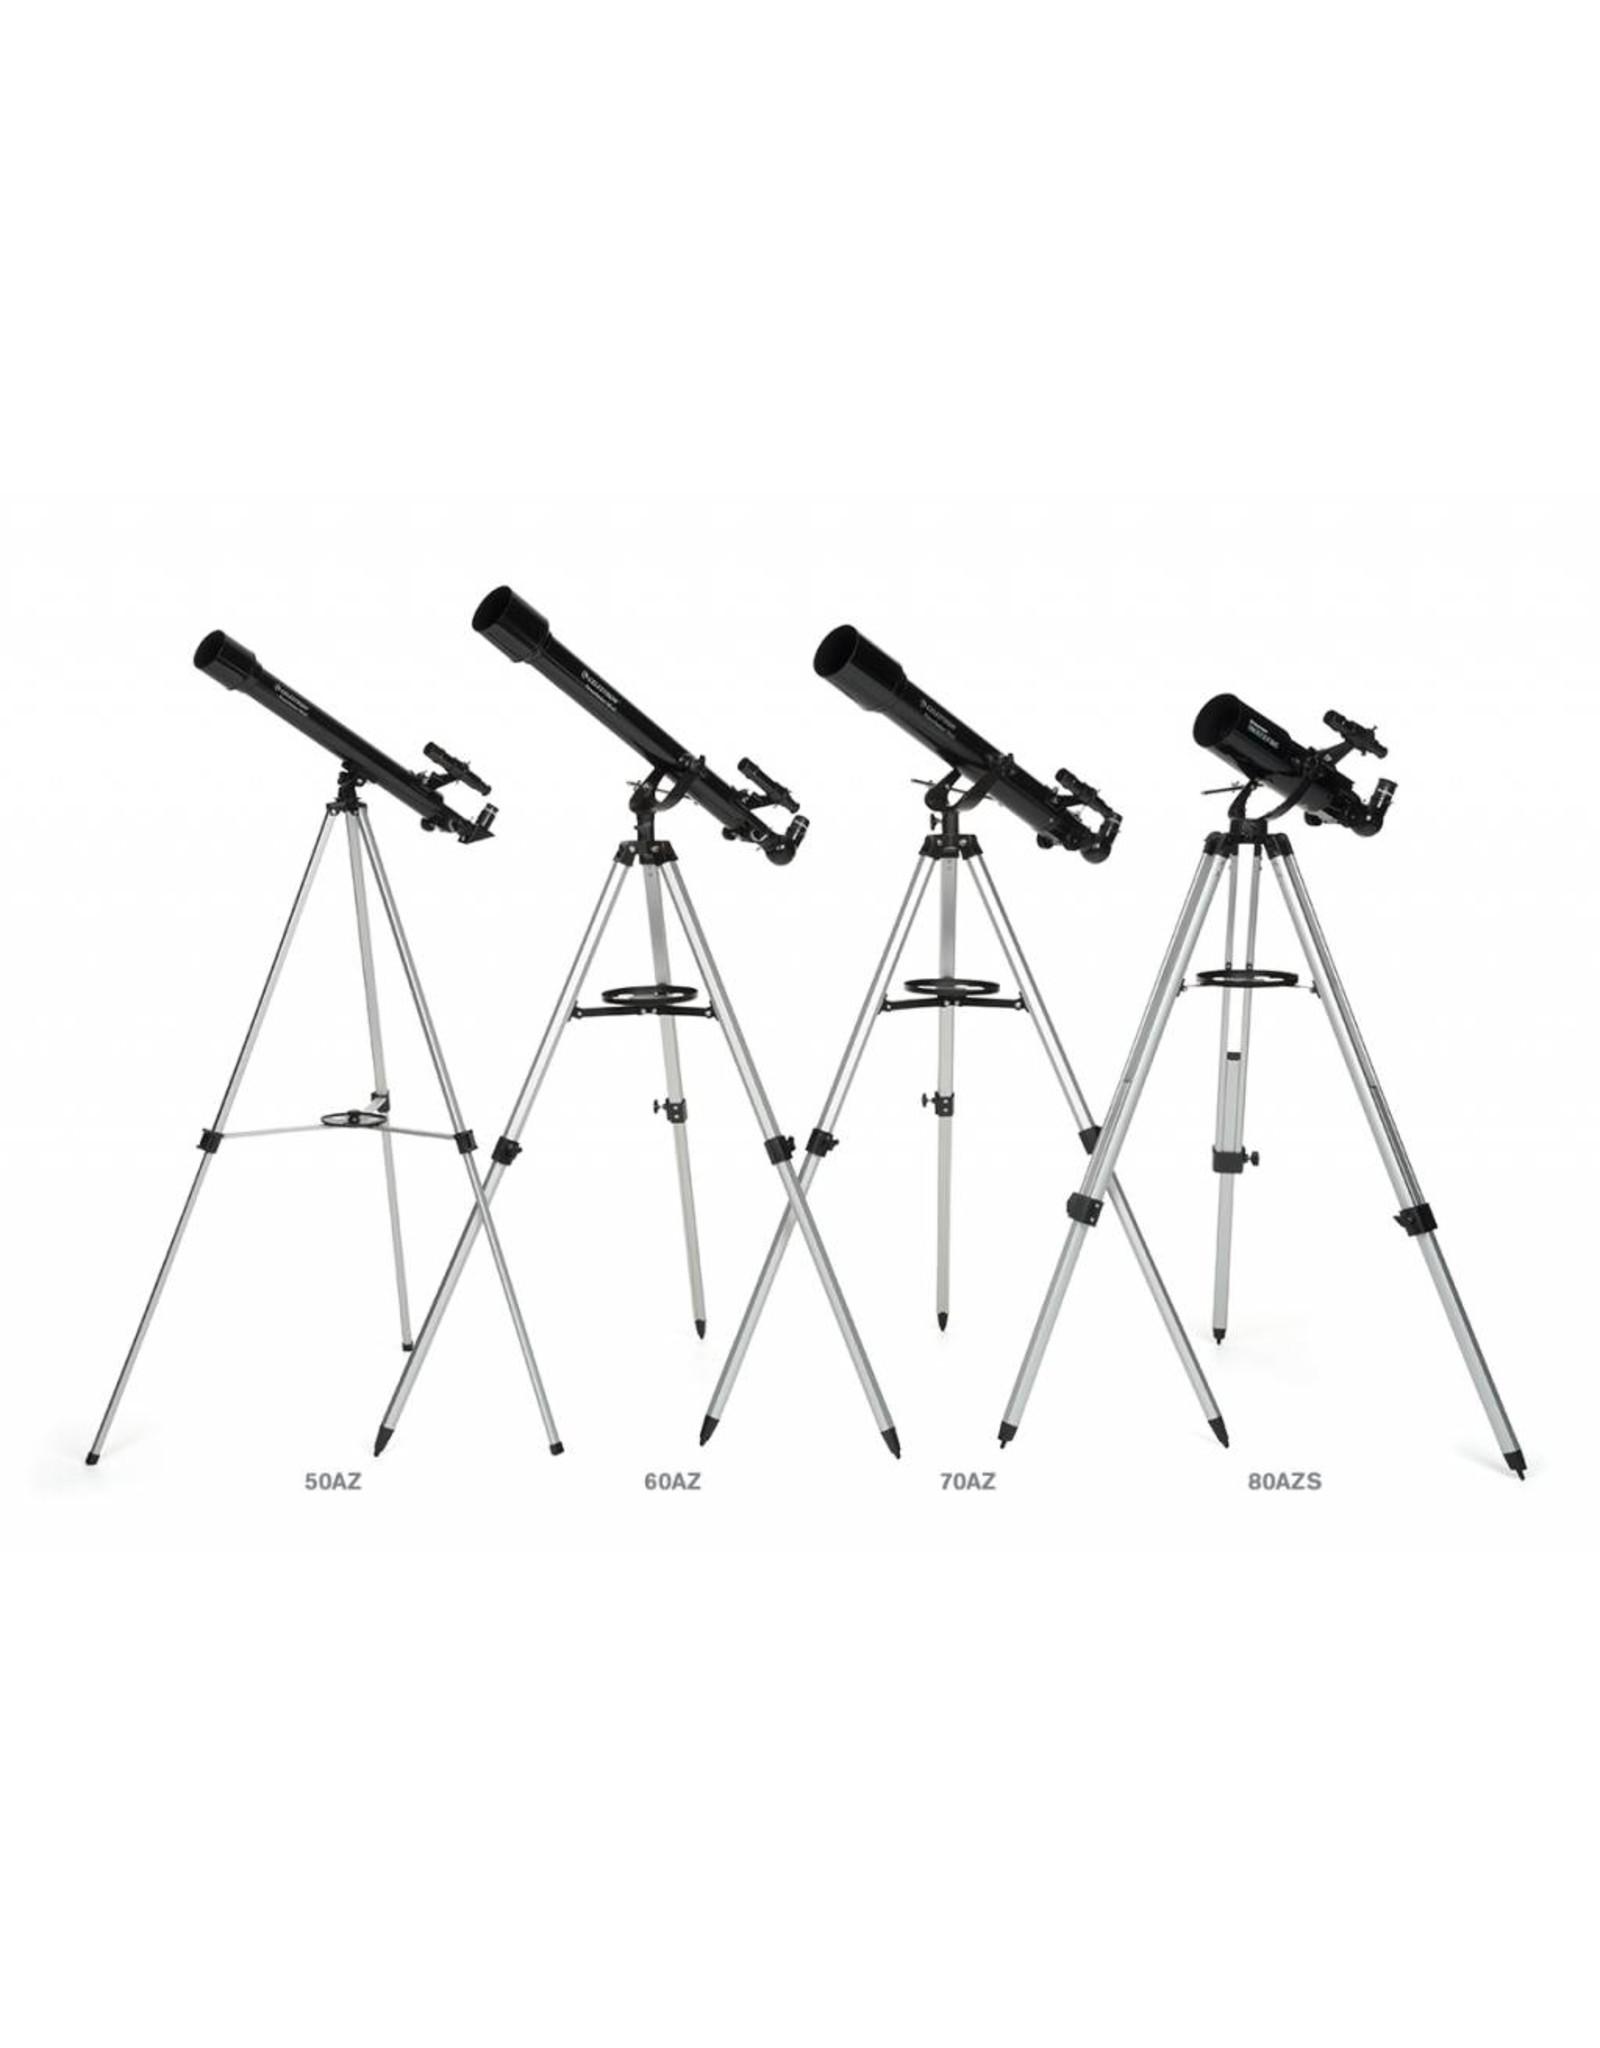 Celestron Celestron PowerSeeker 50AZ Telescope